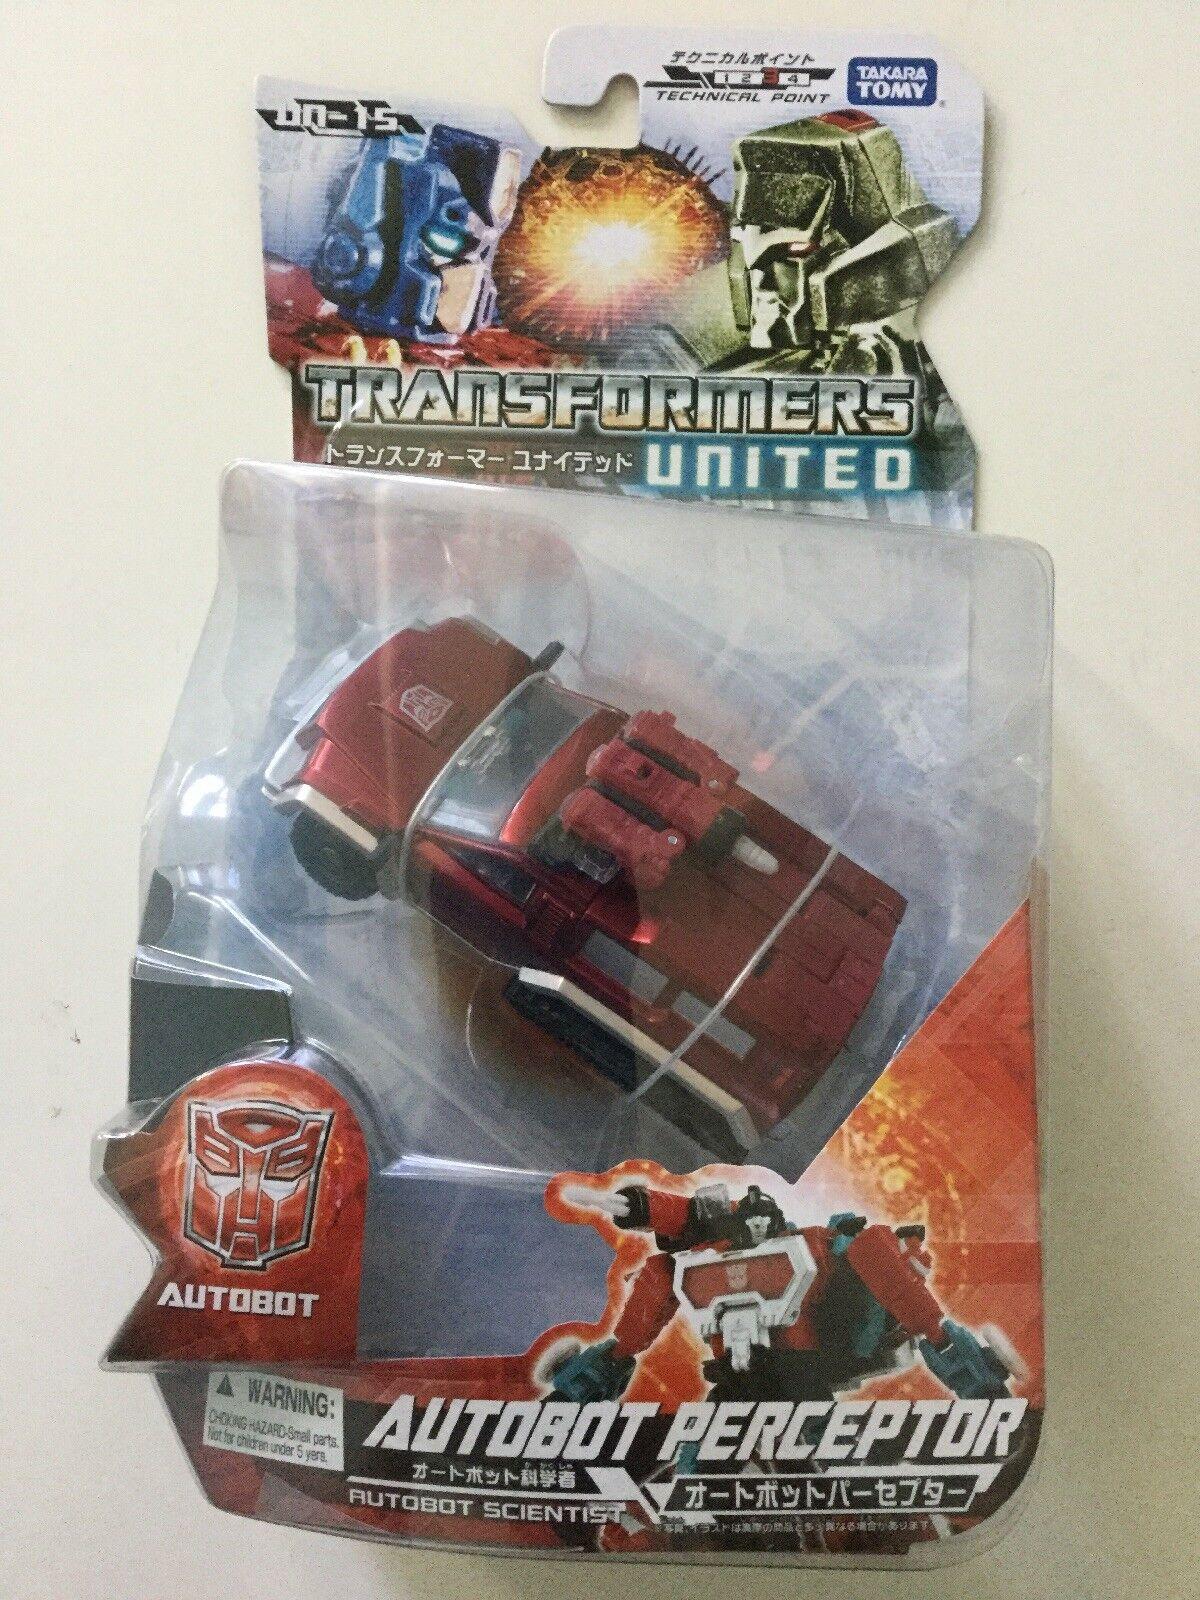 Transformers United UN-15 Autobot Perceptor